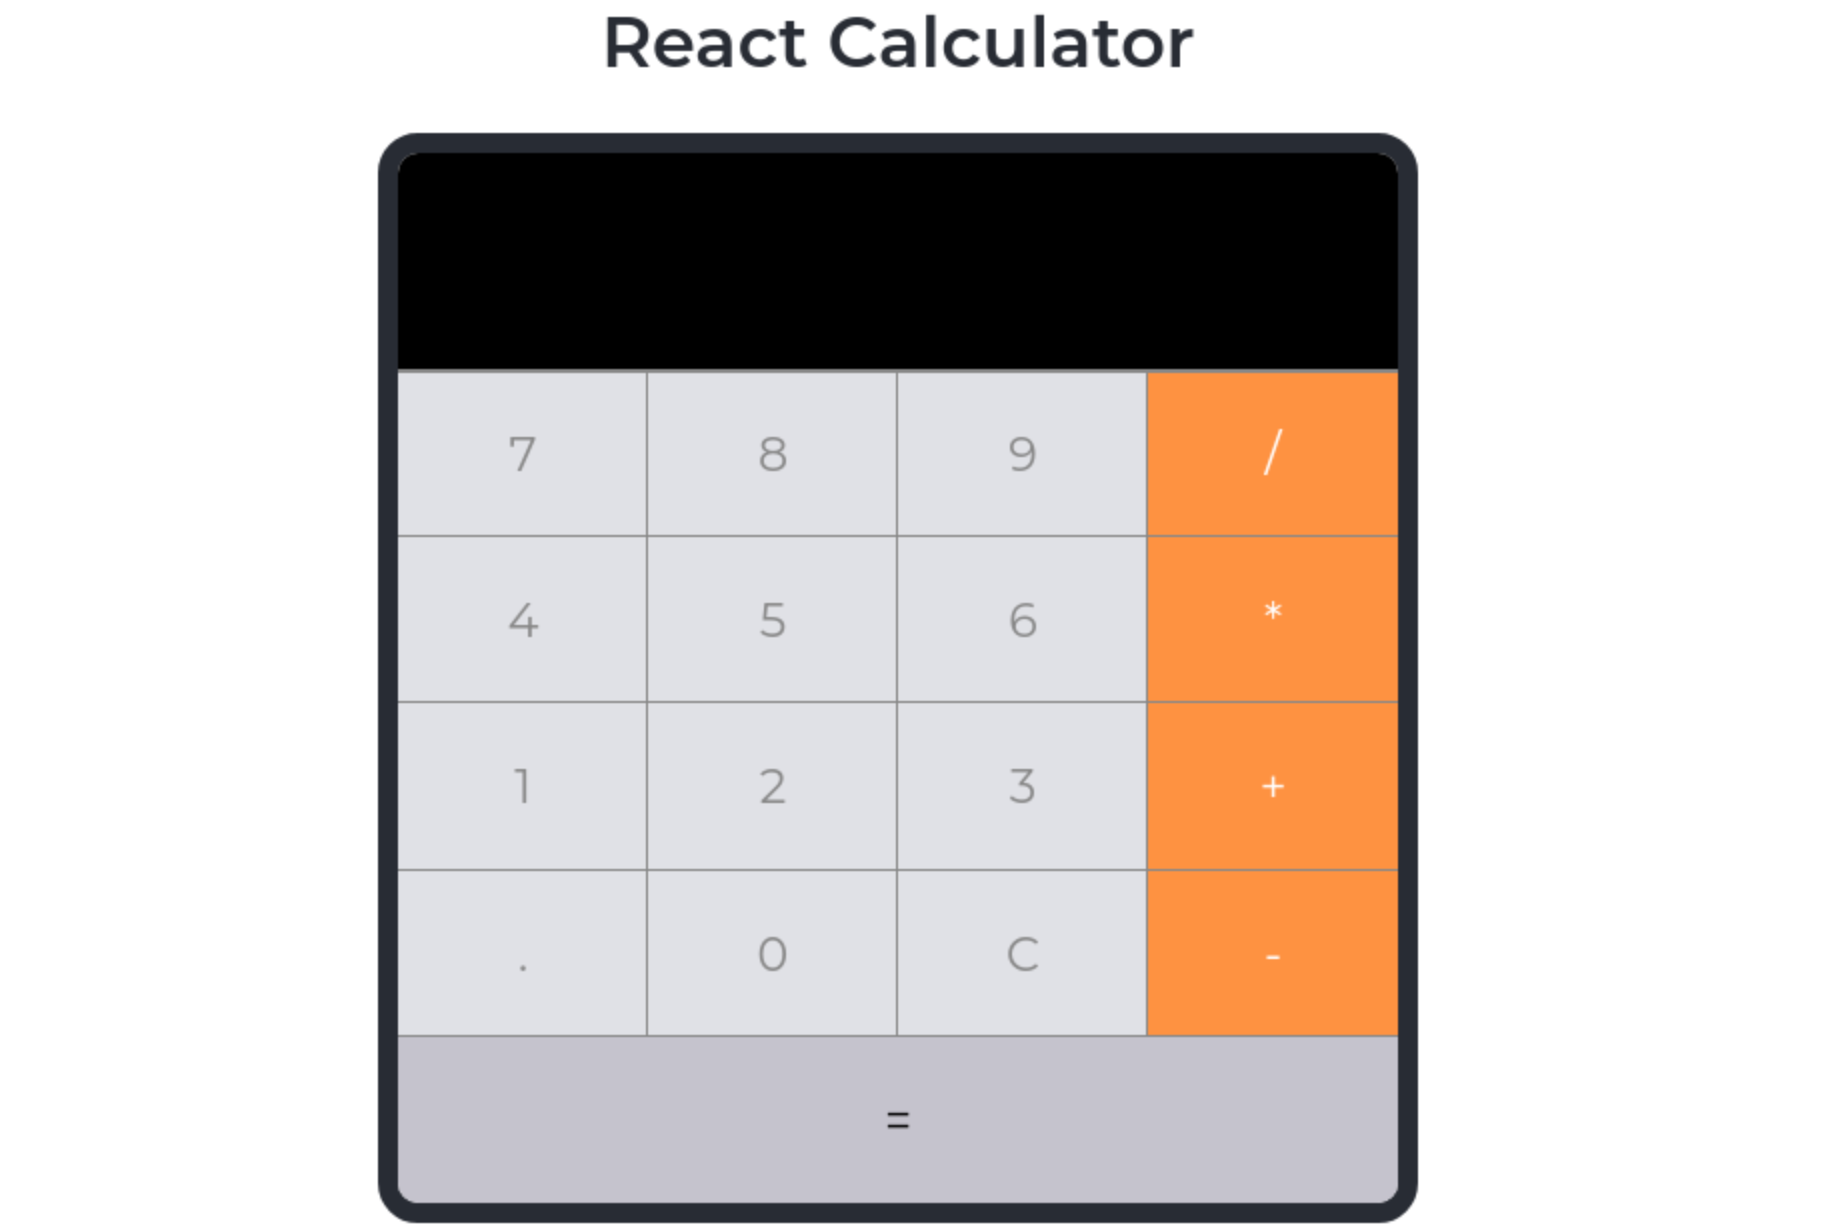 Simple Calculator demo